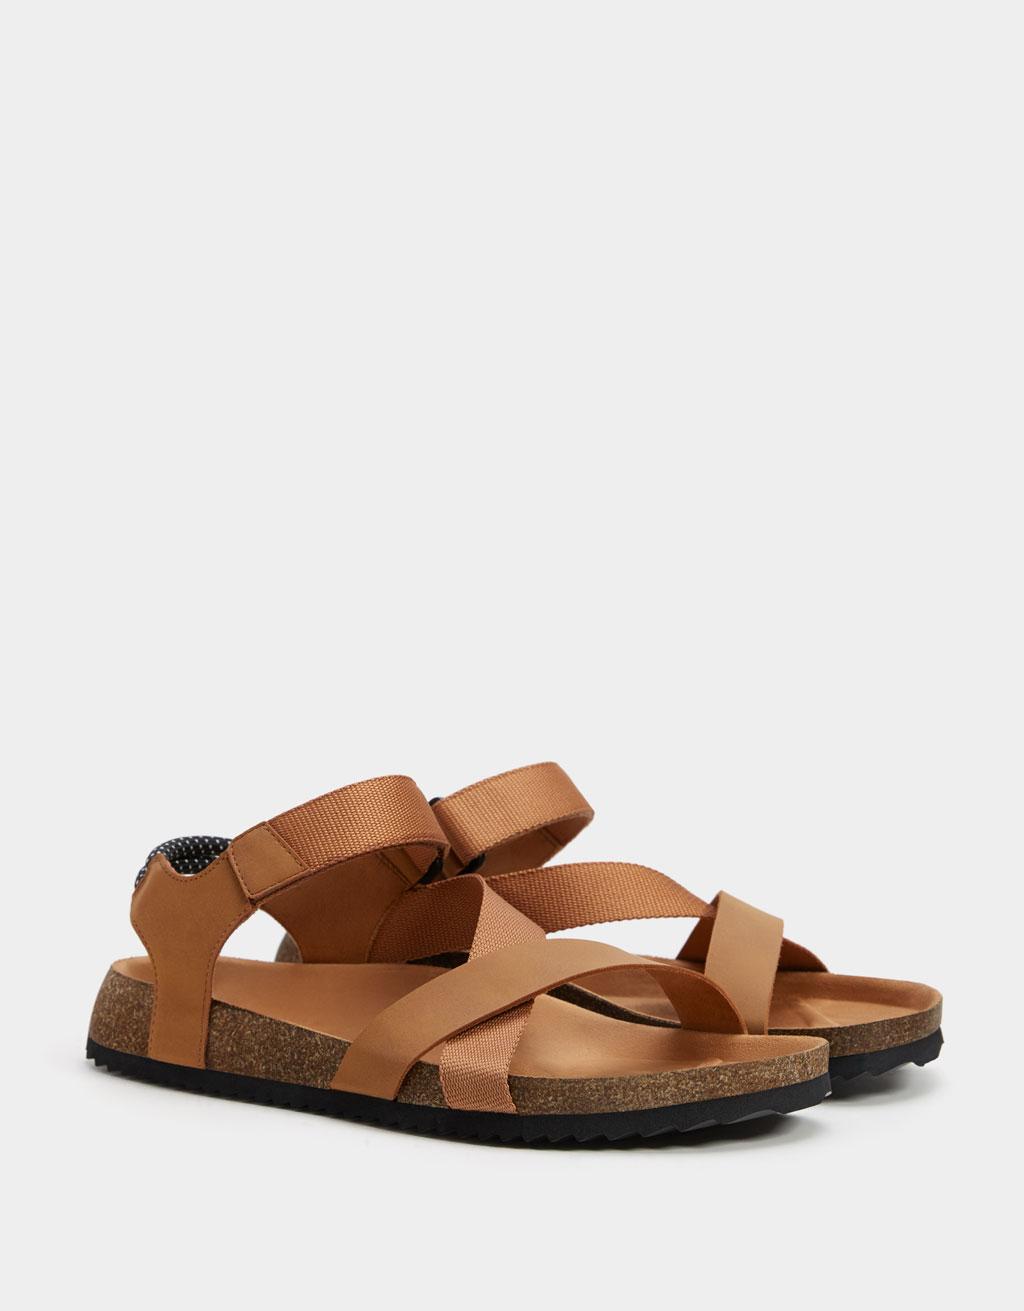 Men's multi-strap sandals